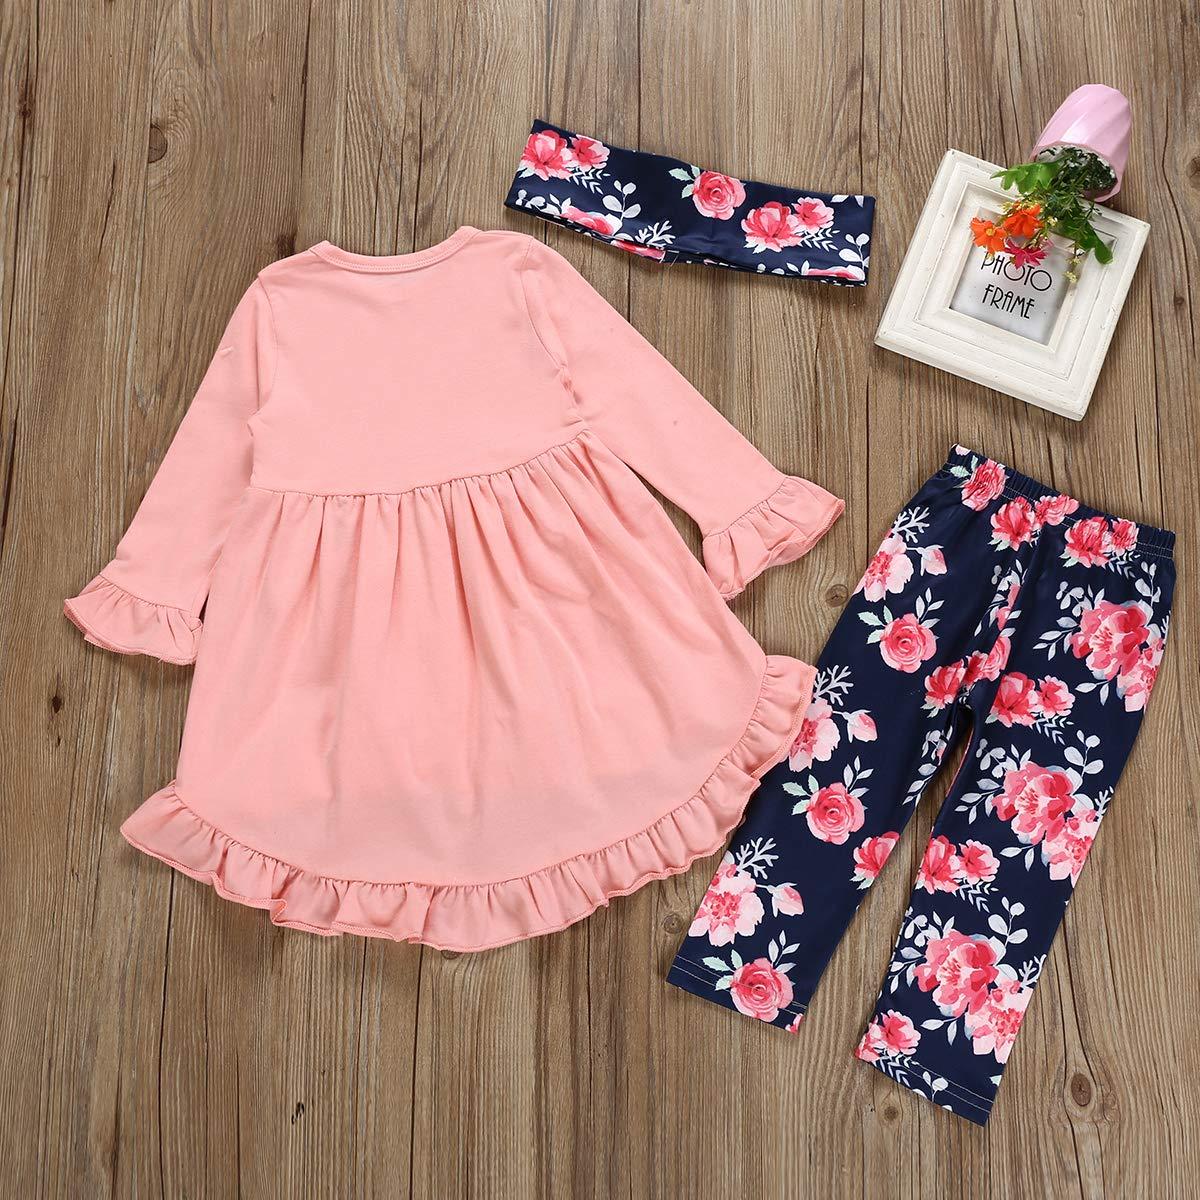 Toddler Girl Spring Ruffles Irregular Mini Dress Tops Long Pants Scarf 3PCS Clothing Set